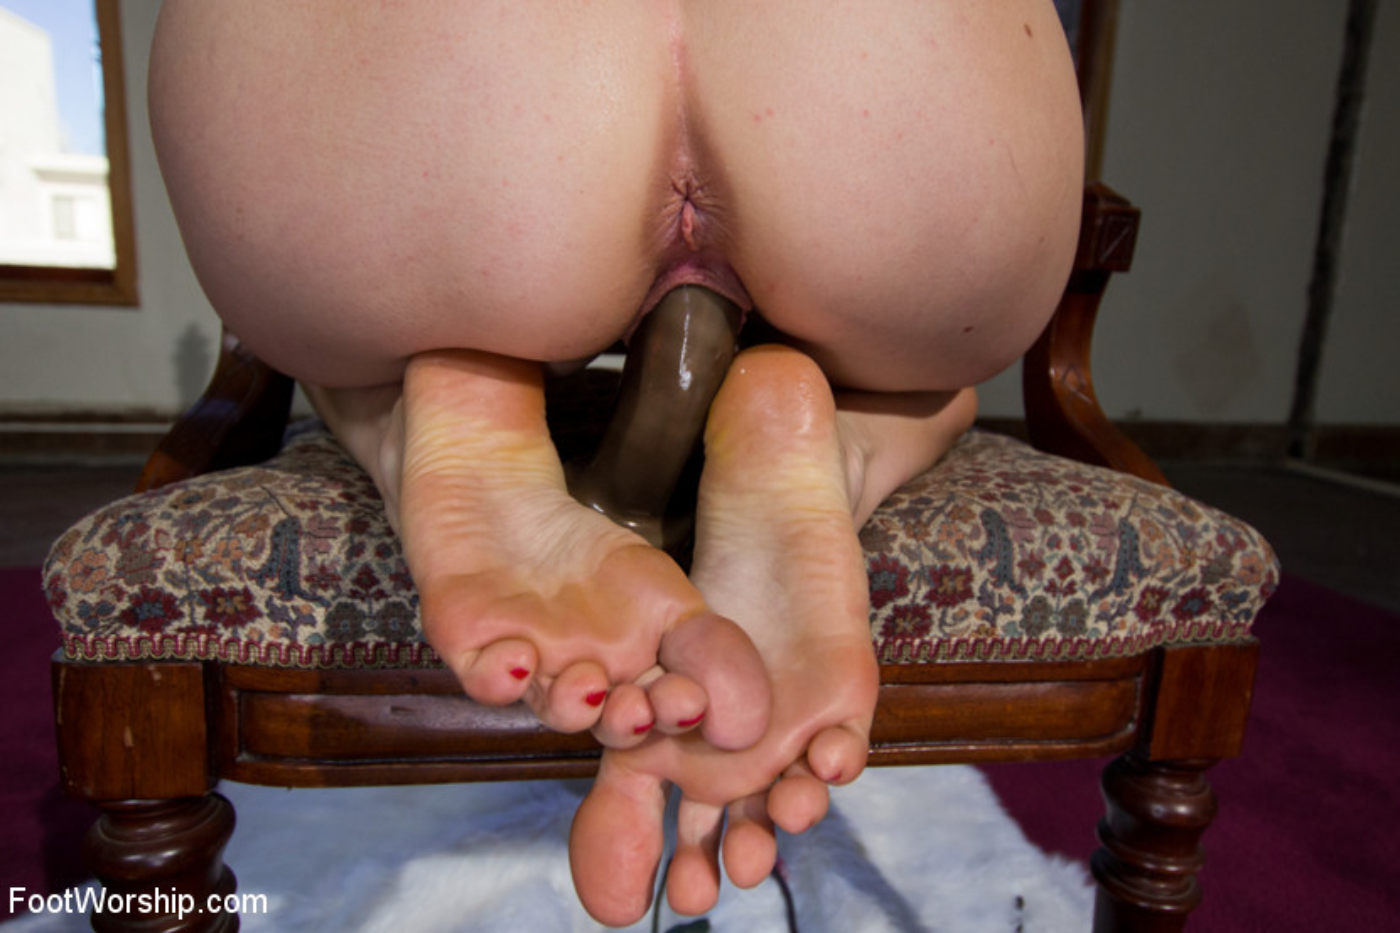 Lesbian Foot Fetish Bondage